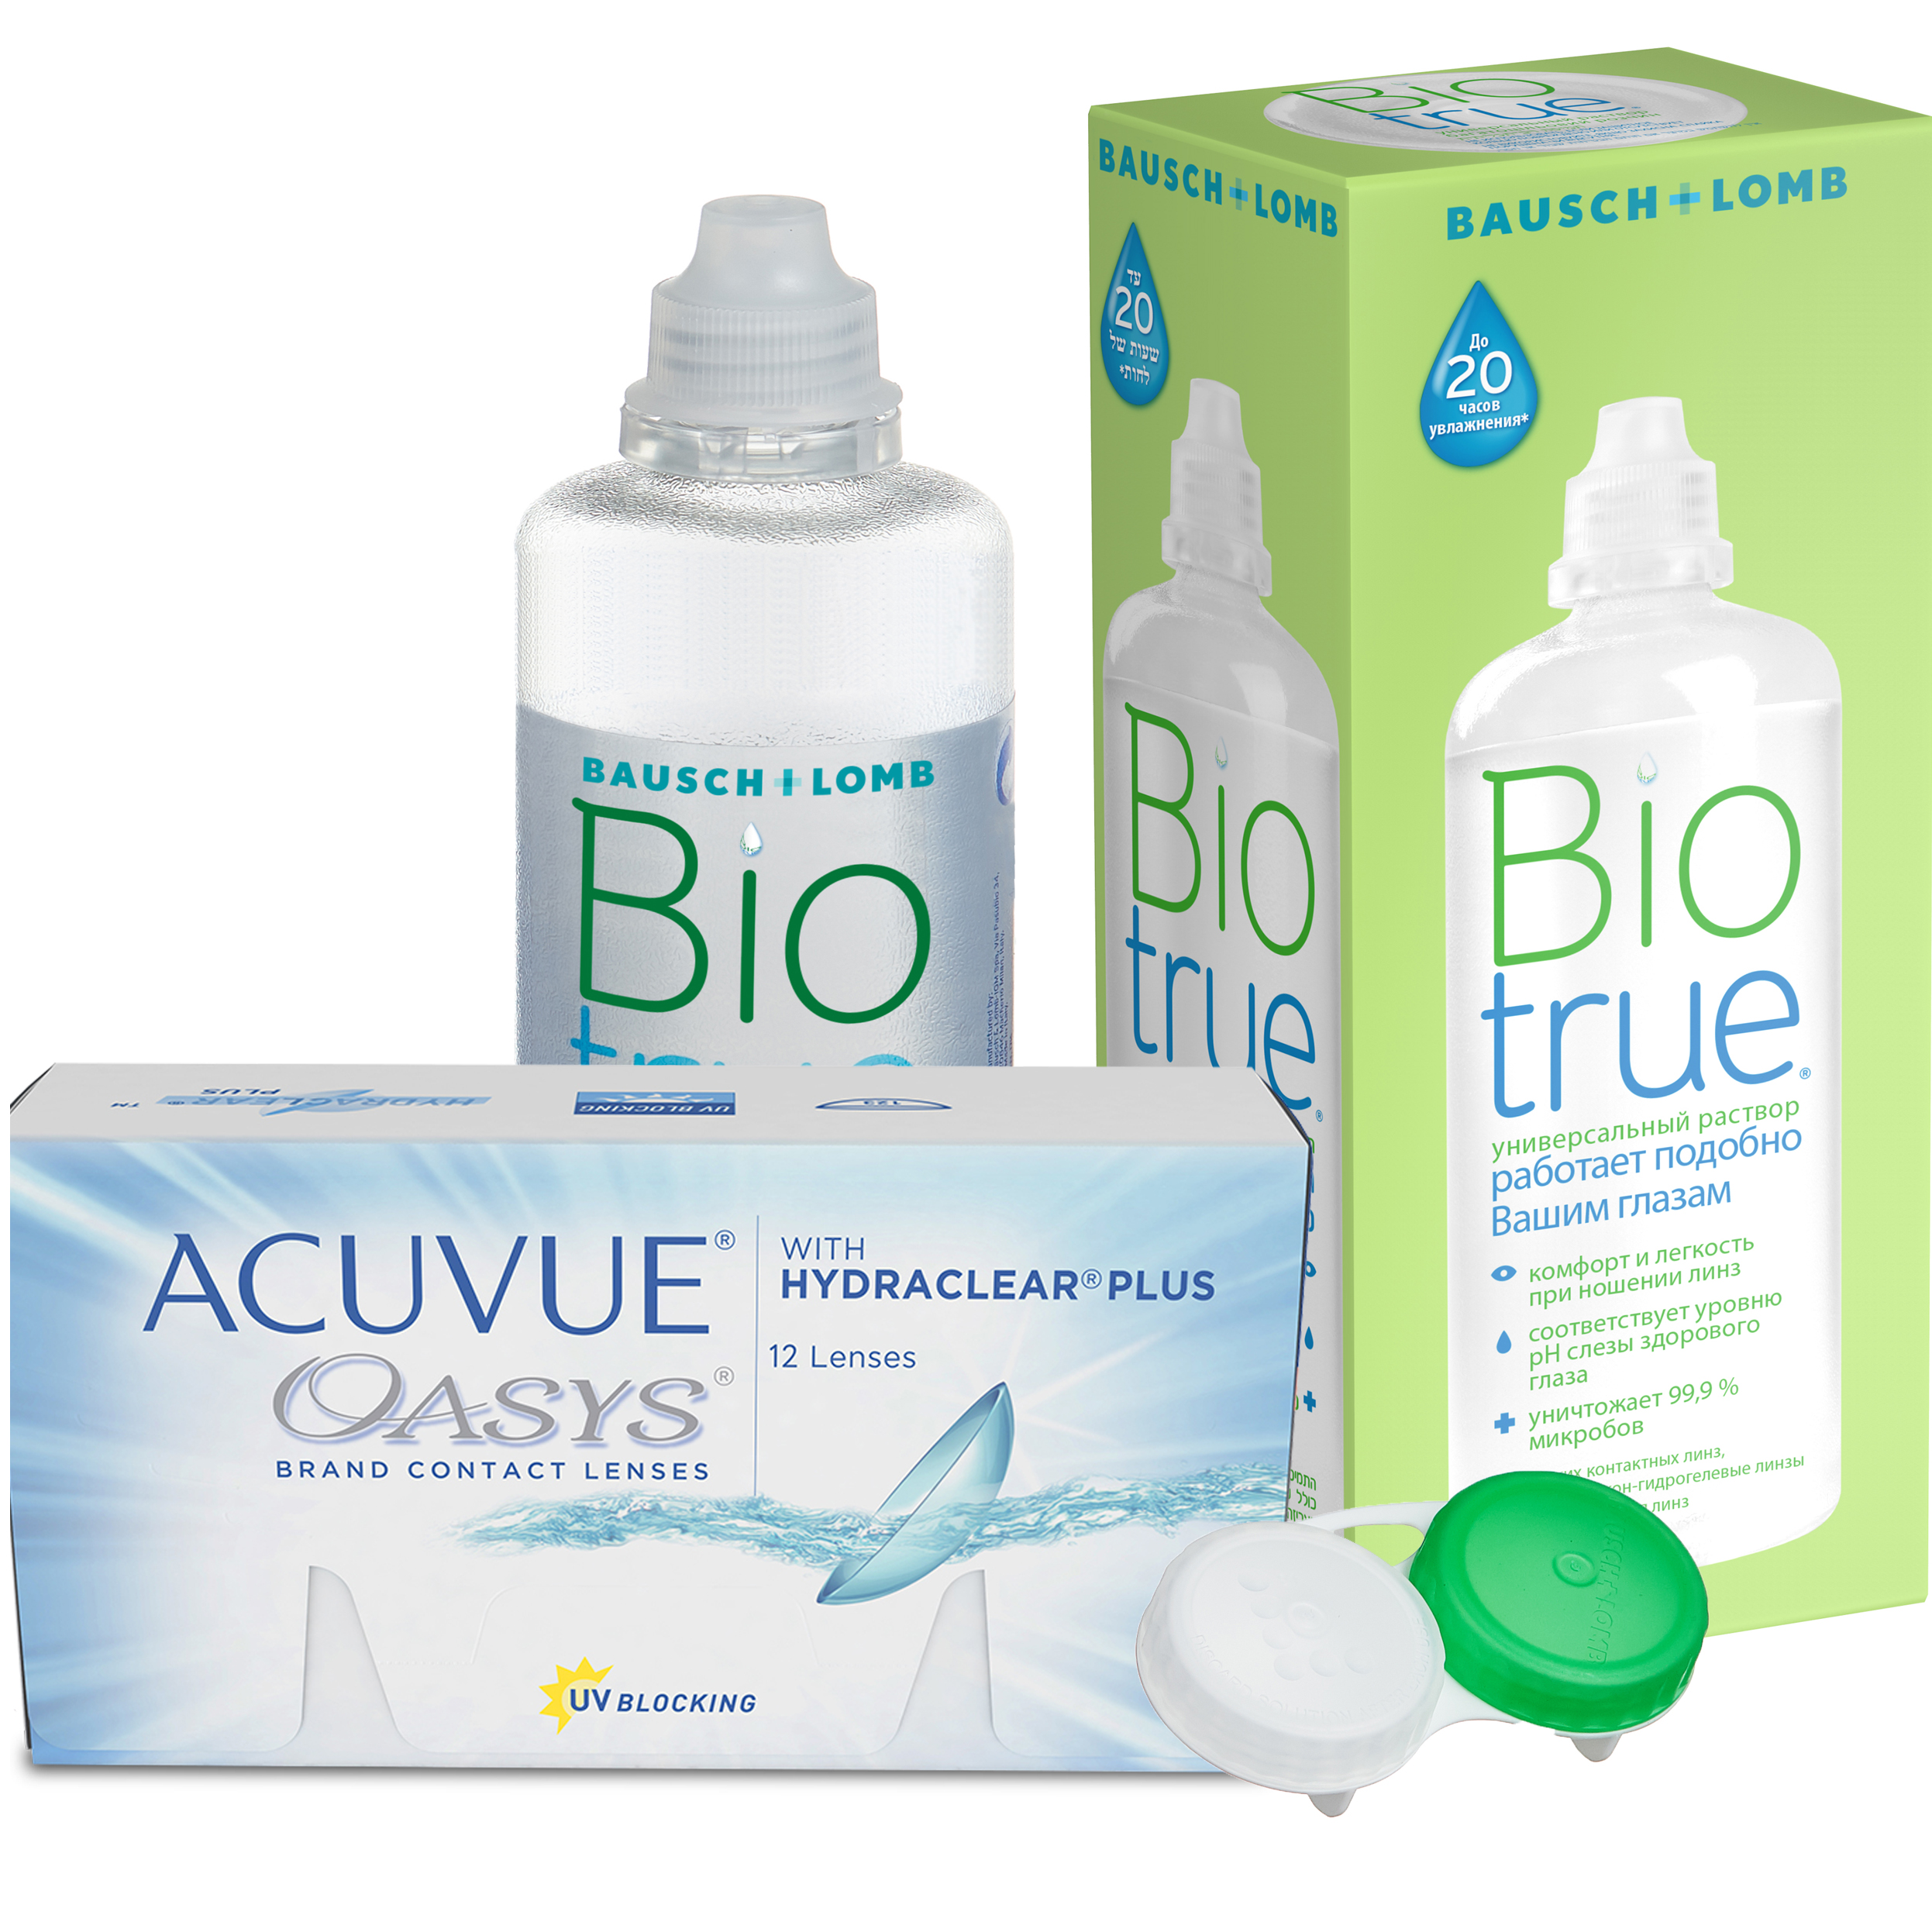 Купить Oasys with Hydraclear Plus 12 линз + Biotrue, Контактные линзы Acuvue Oasys with Hydraclear Plus 12 линз R 8.8 +0, 50 + Biotrue 300 мл